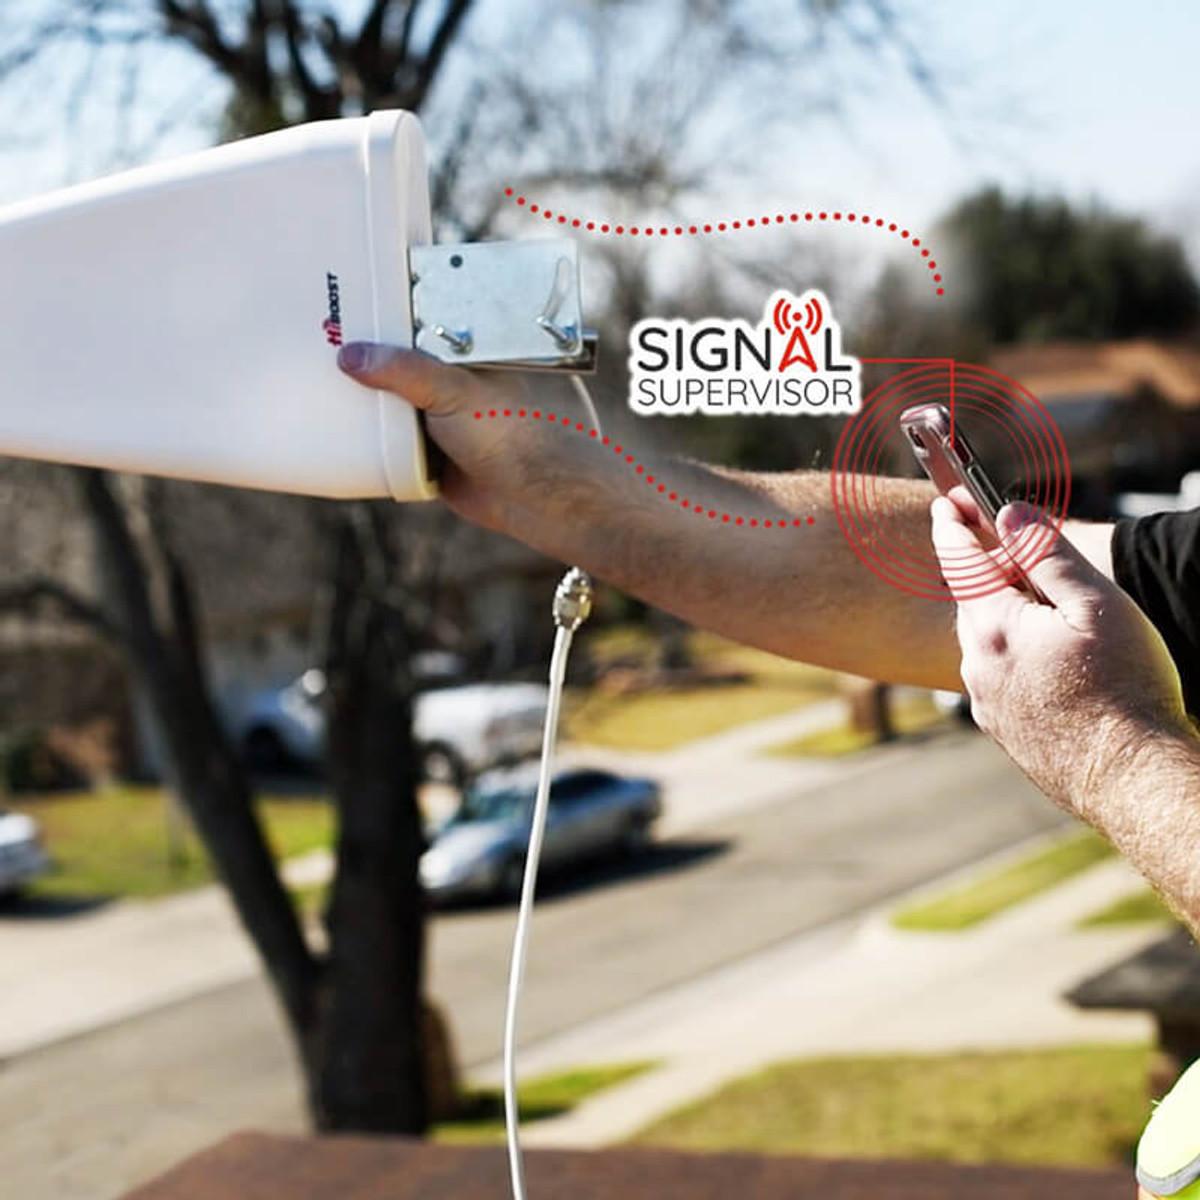 HiBoost Home 15K Smart Link Signal Booster Roof-Mounted Yagi Antenna